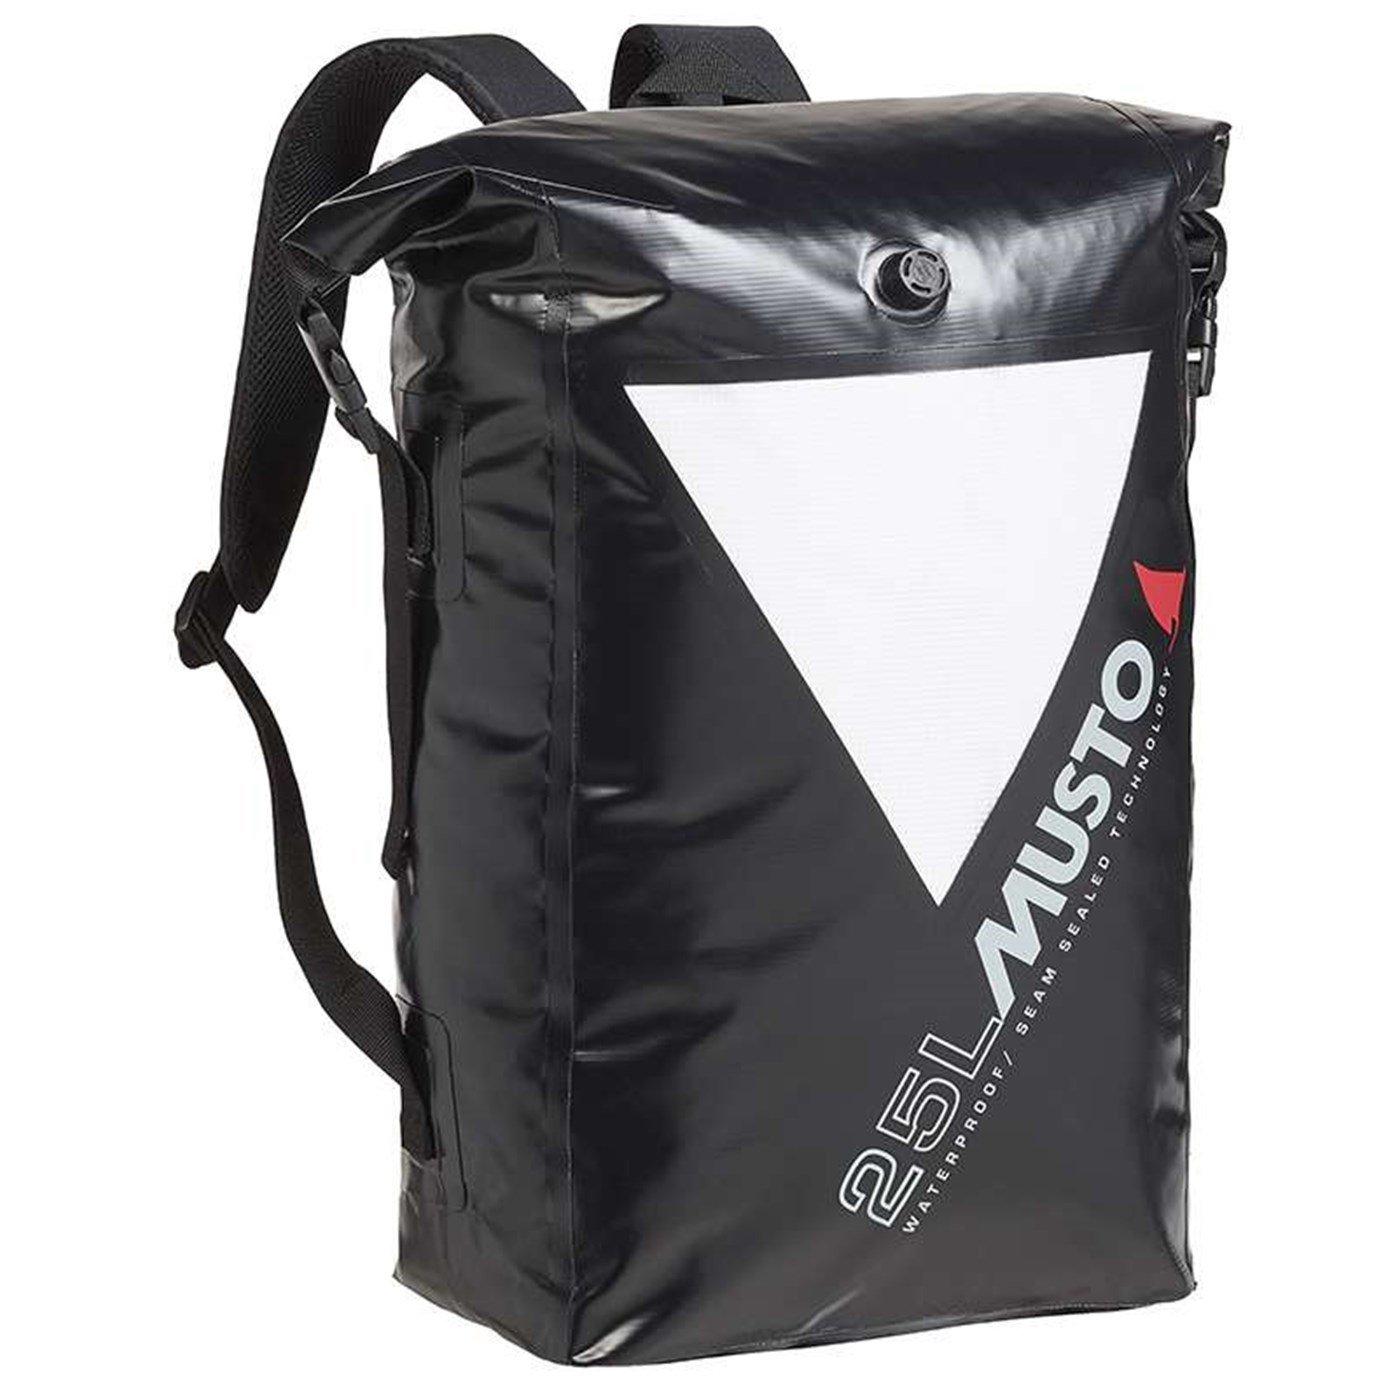 Musto Fully Waterproof Dry 25L Backpack e93e6d6ba4e59